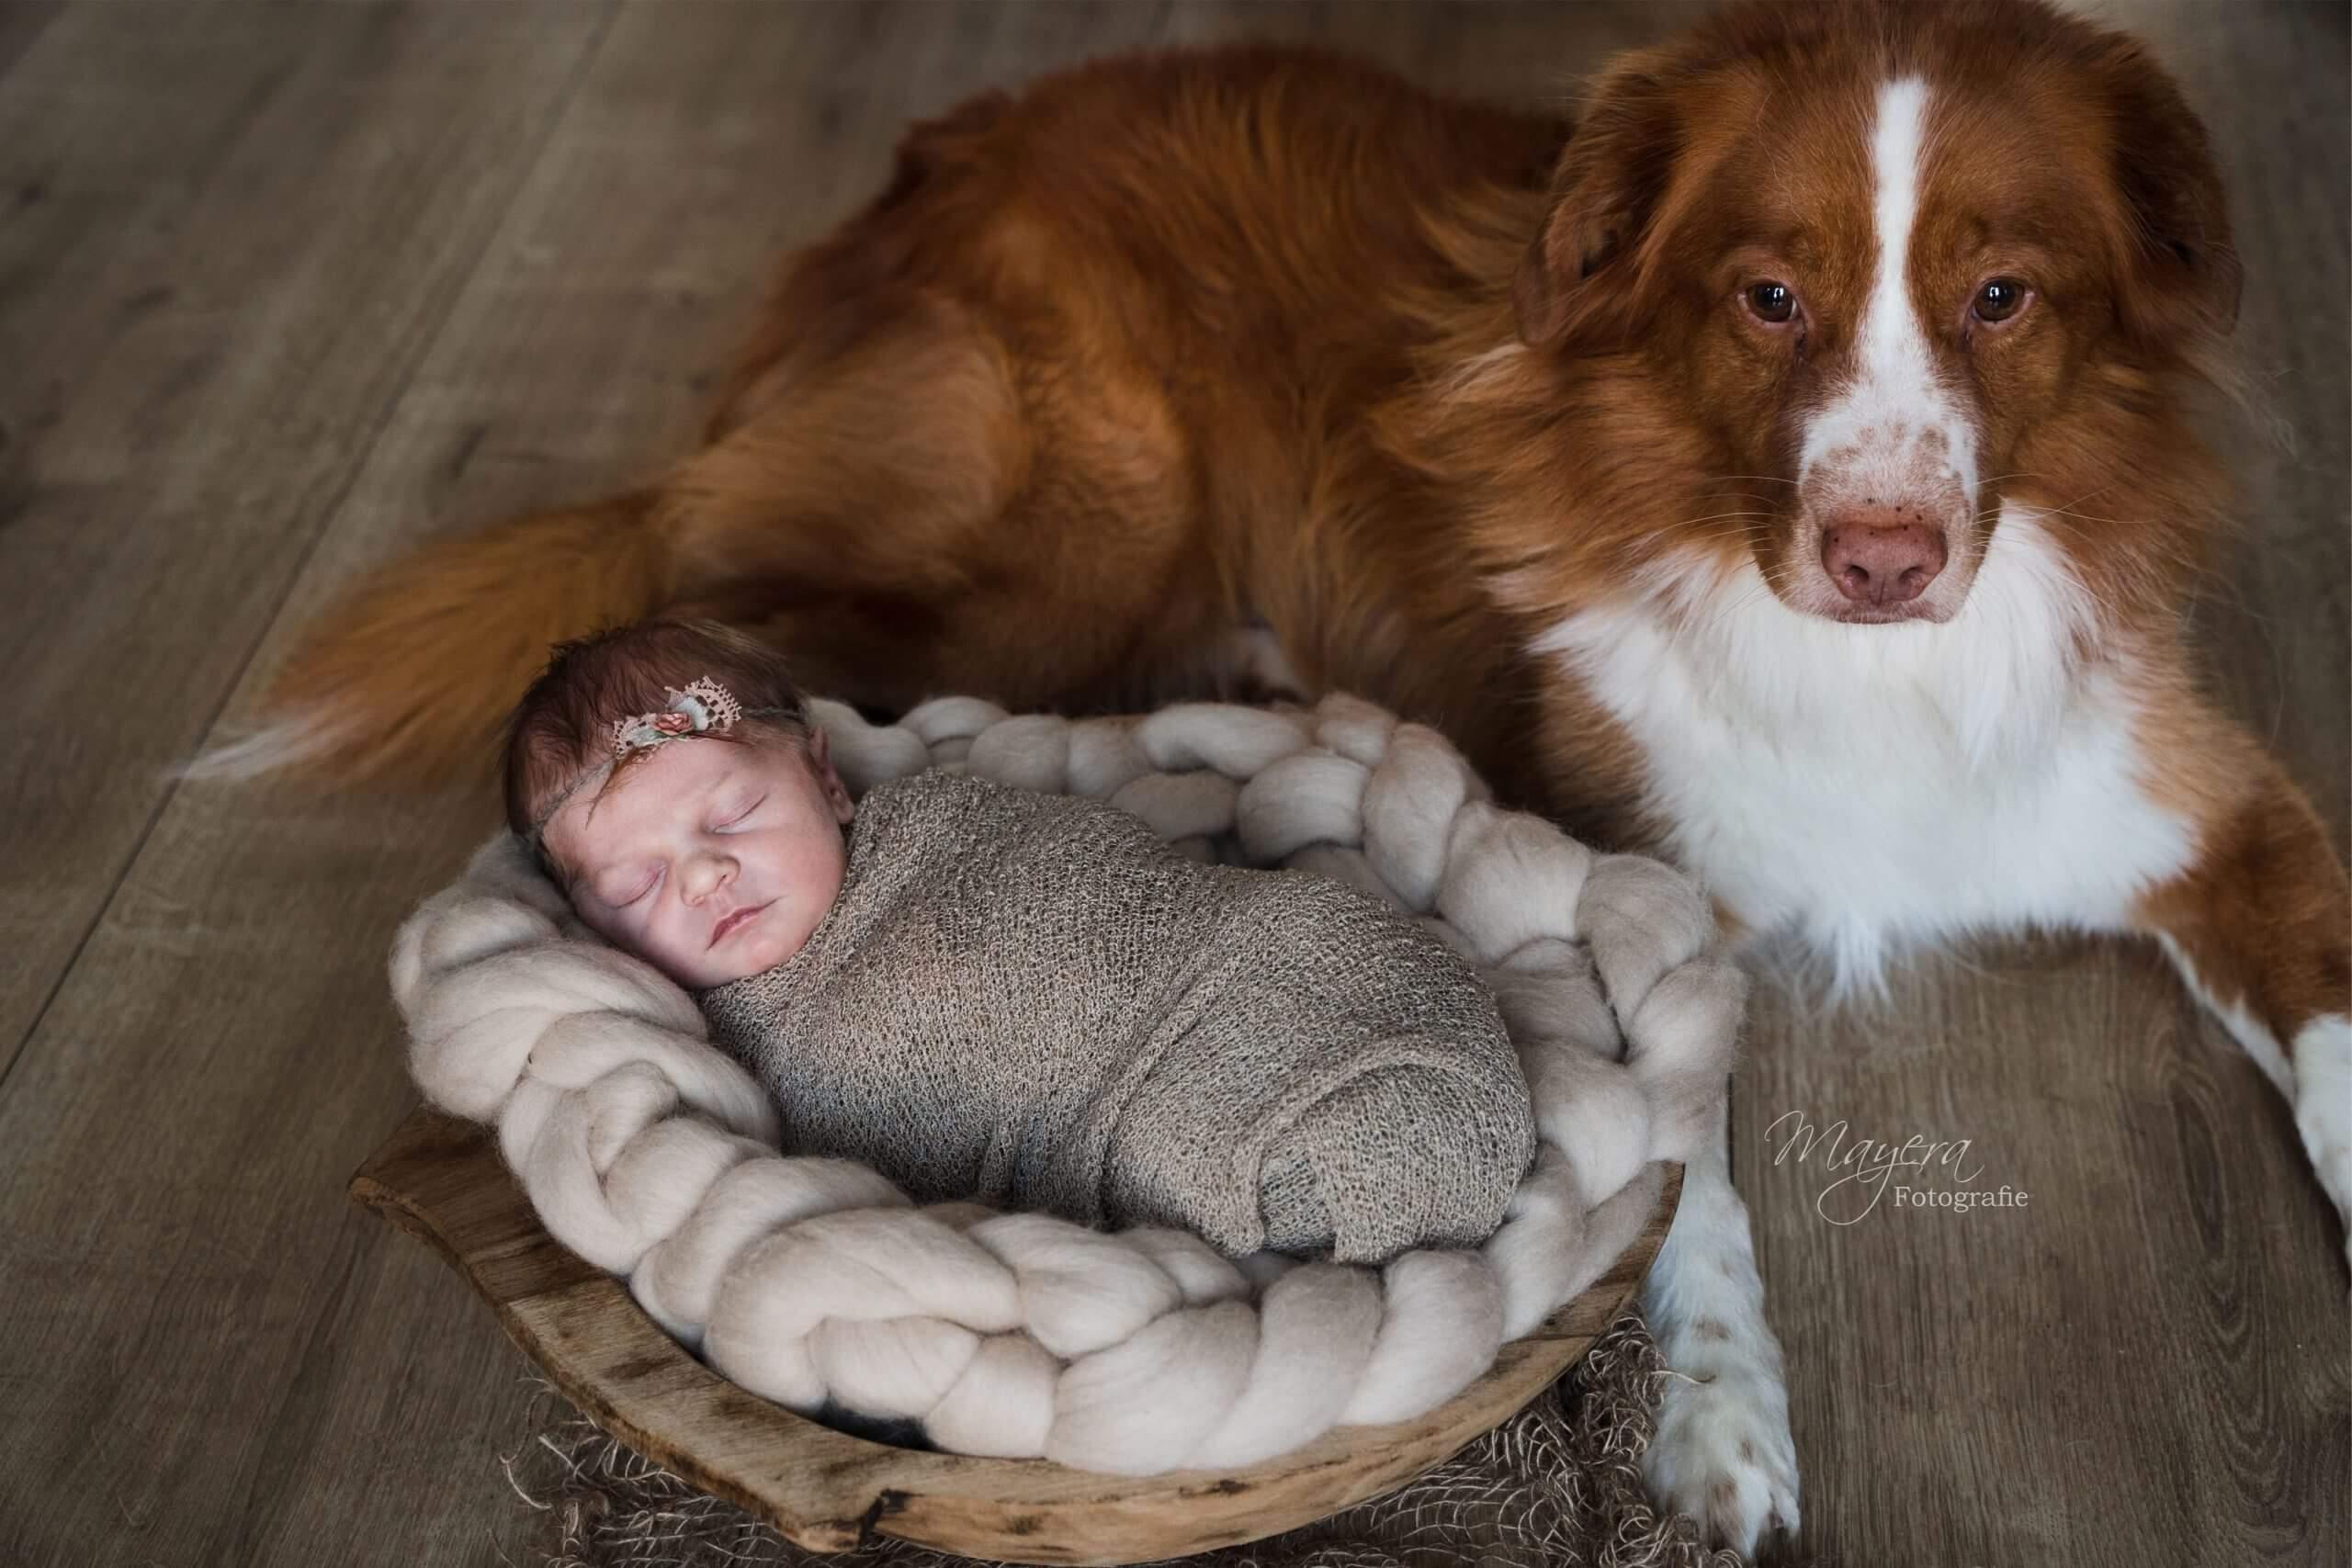 a-newborn-hond-baby-gezin-wijk-bij-duurstede-scaled